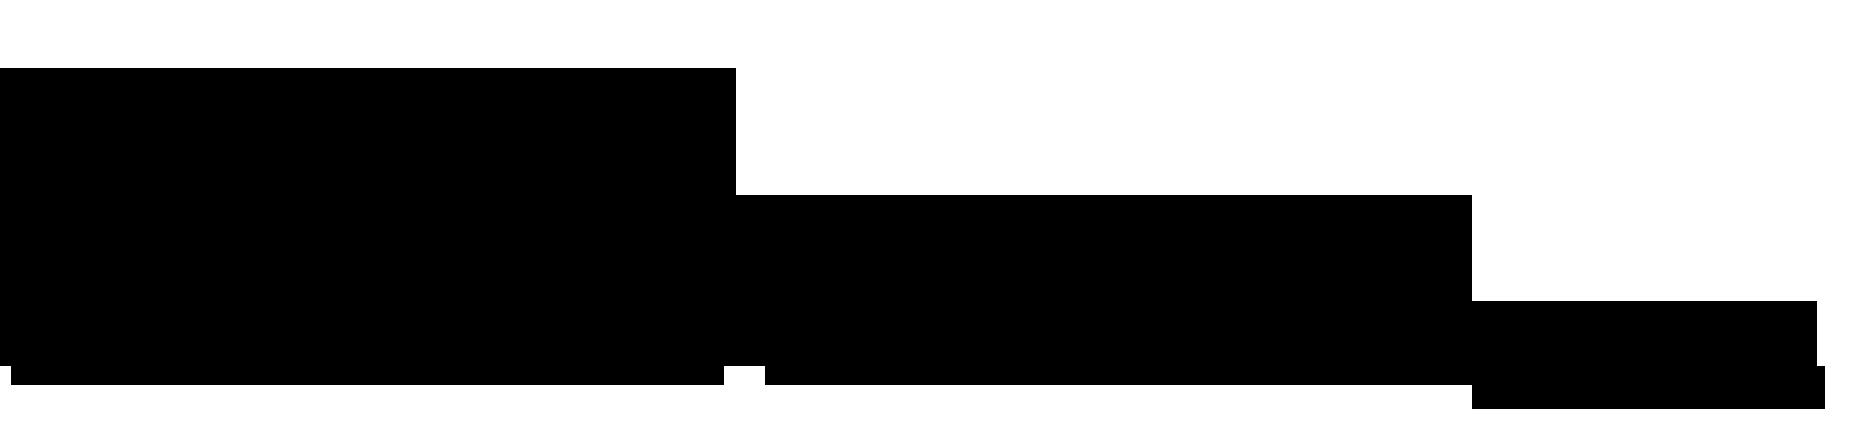 78-01